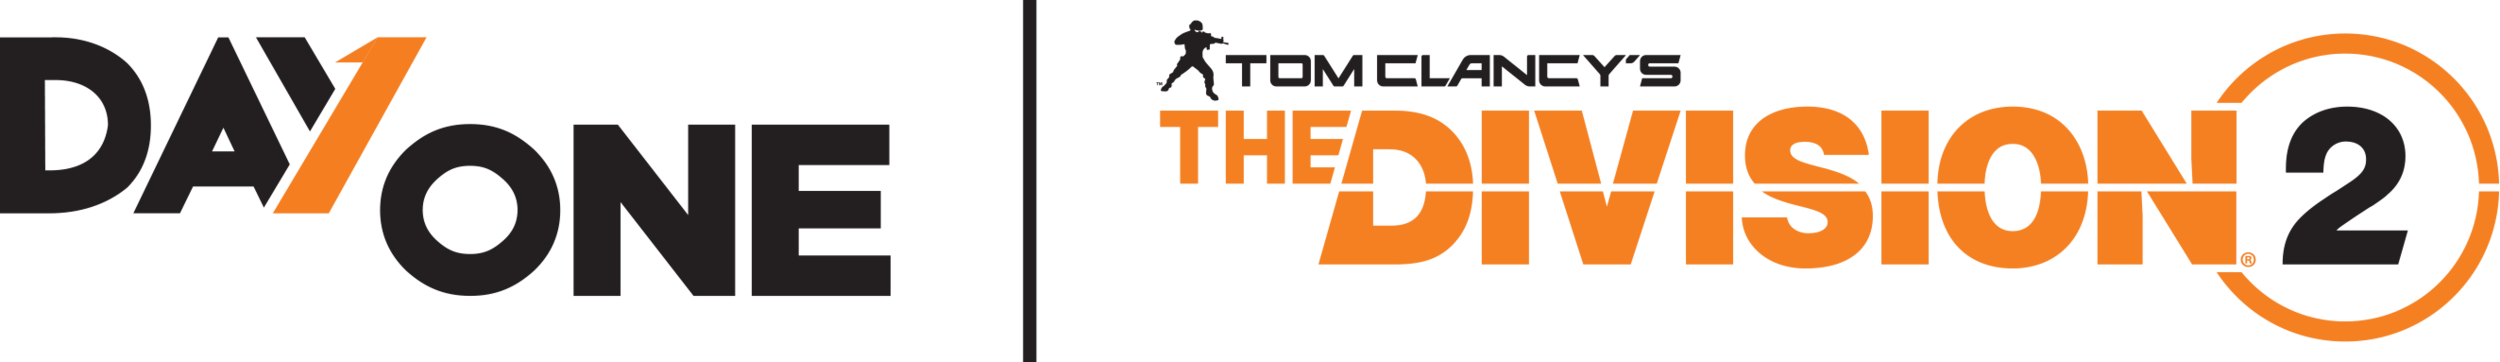 dayone_logo.png